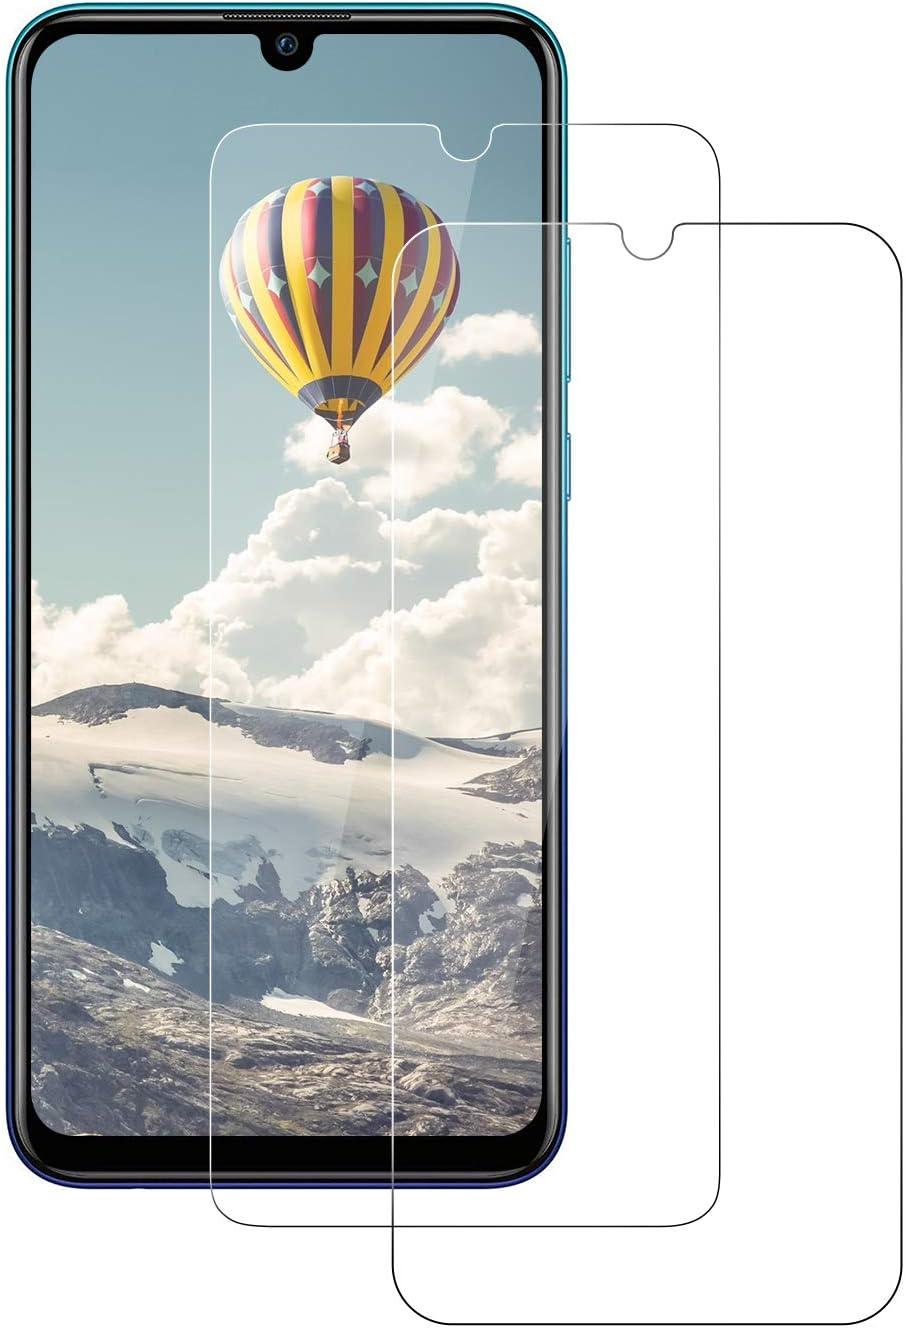 POOPHUNS Cristal Templado Huawei P Smart 2019/Honor 10 Lite, 2-Unidades Protector de Pantalla Cristal Vidrio Templado Premium para Huawei P Smart 2019/Honor 10 Lite 9H Vidrio Real No se despega